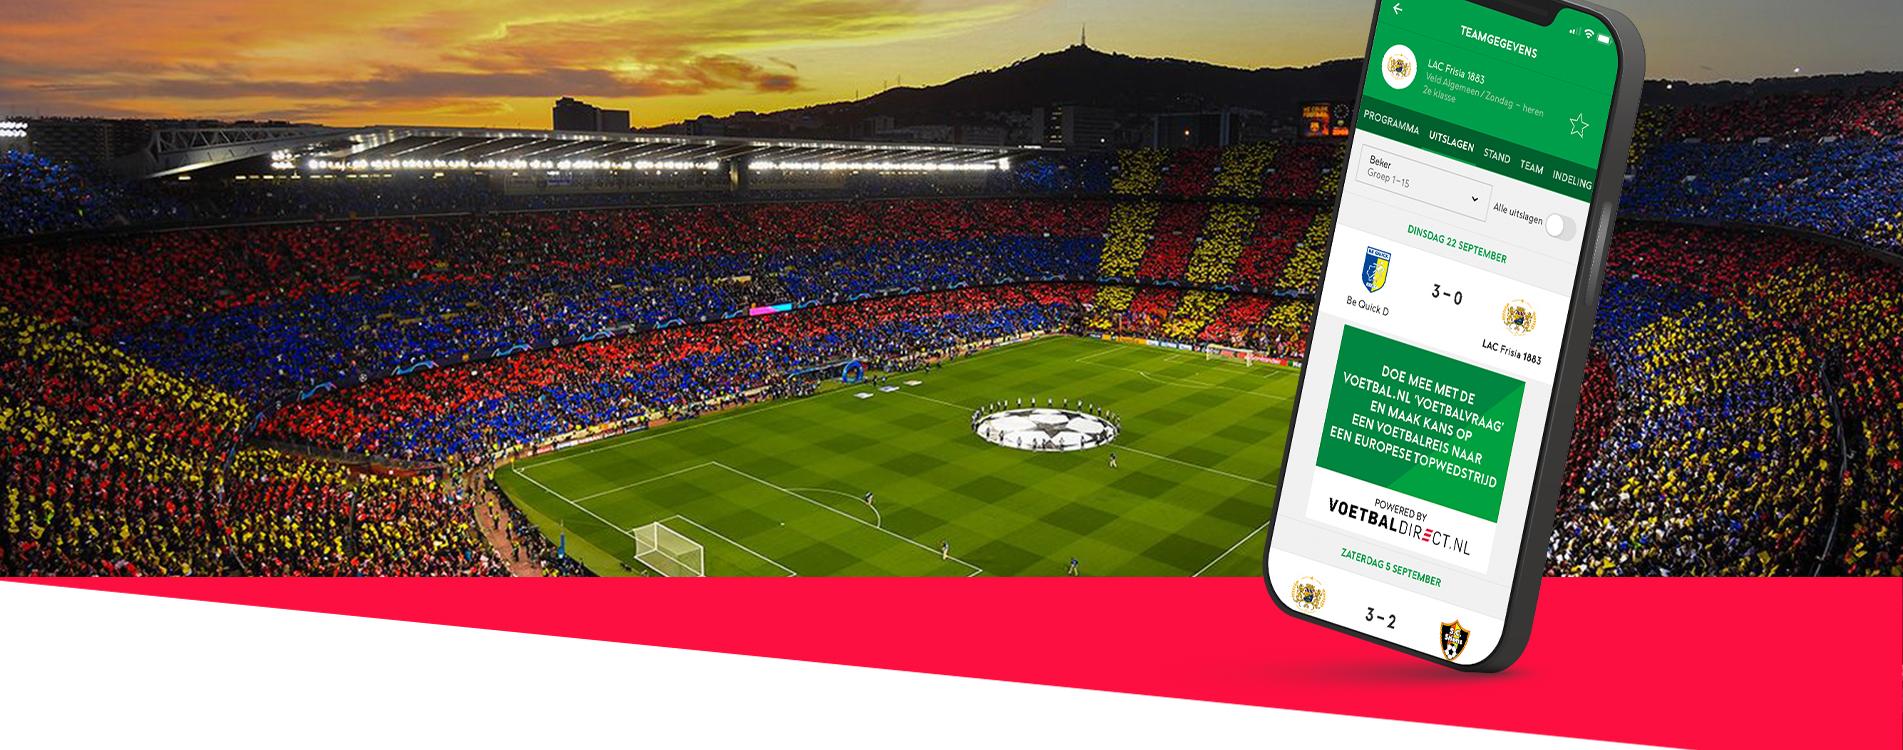 Samenwerking VoetbalDirect & Voetbal.nl